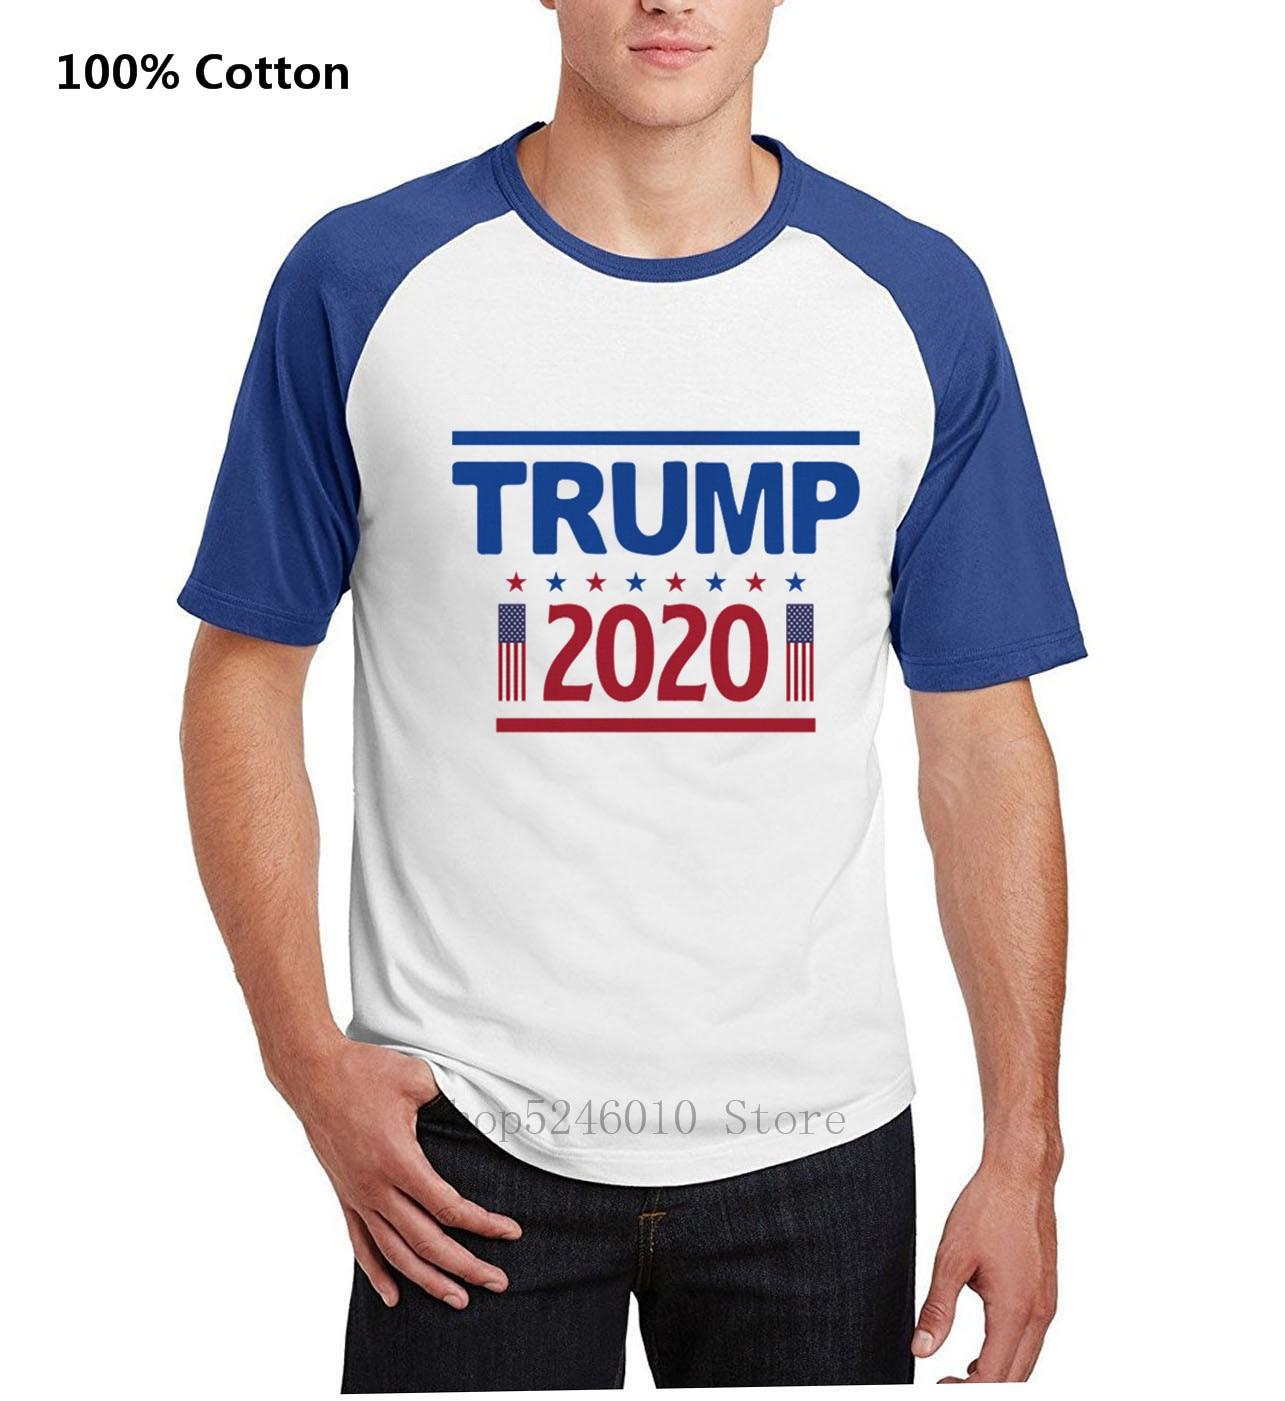 Trump 2020 Mens Fashion Short Sleeve T Shirt